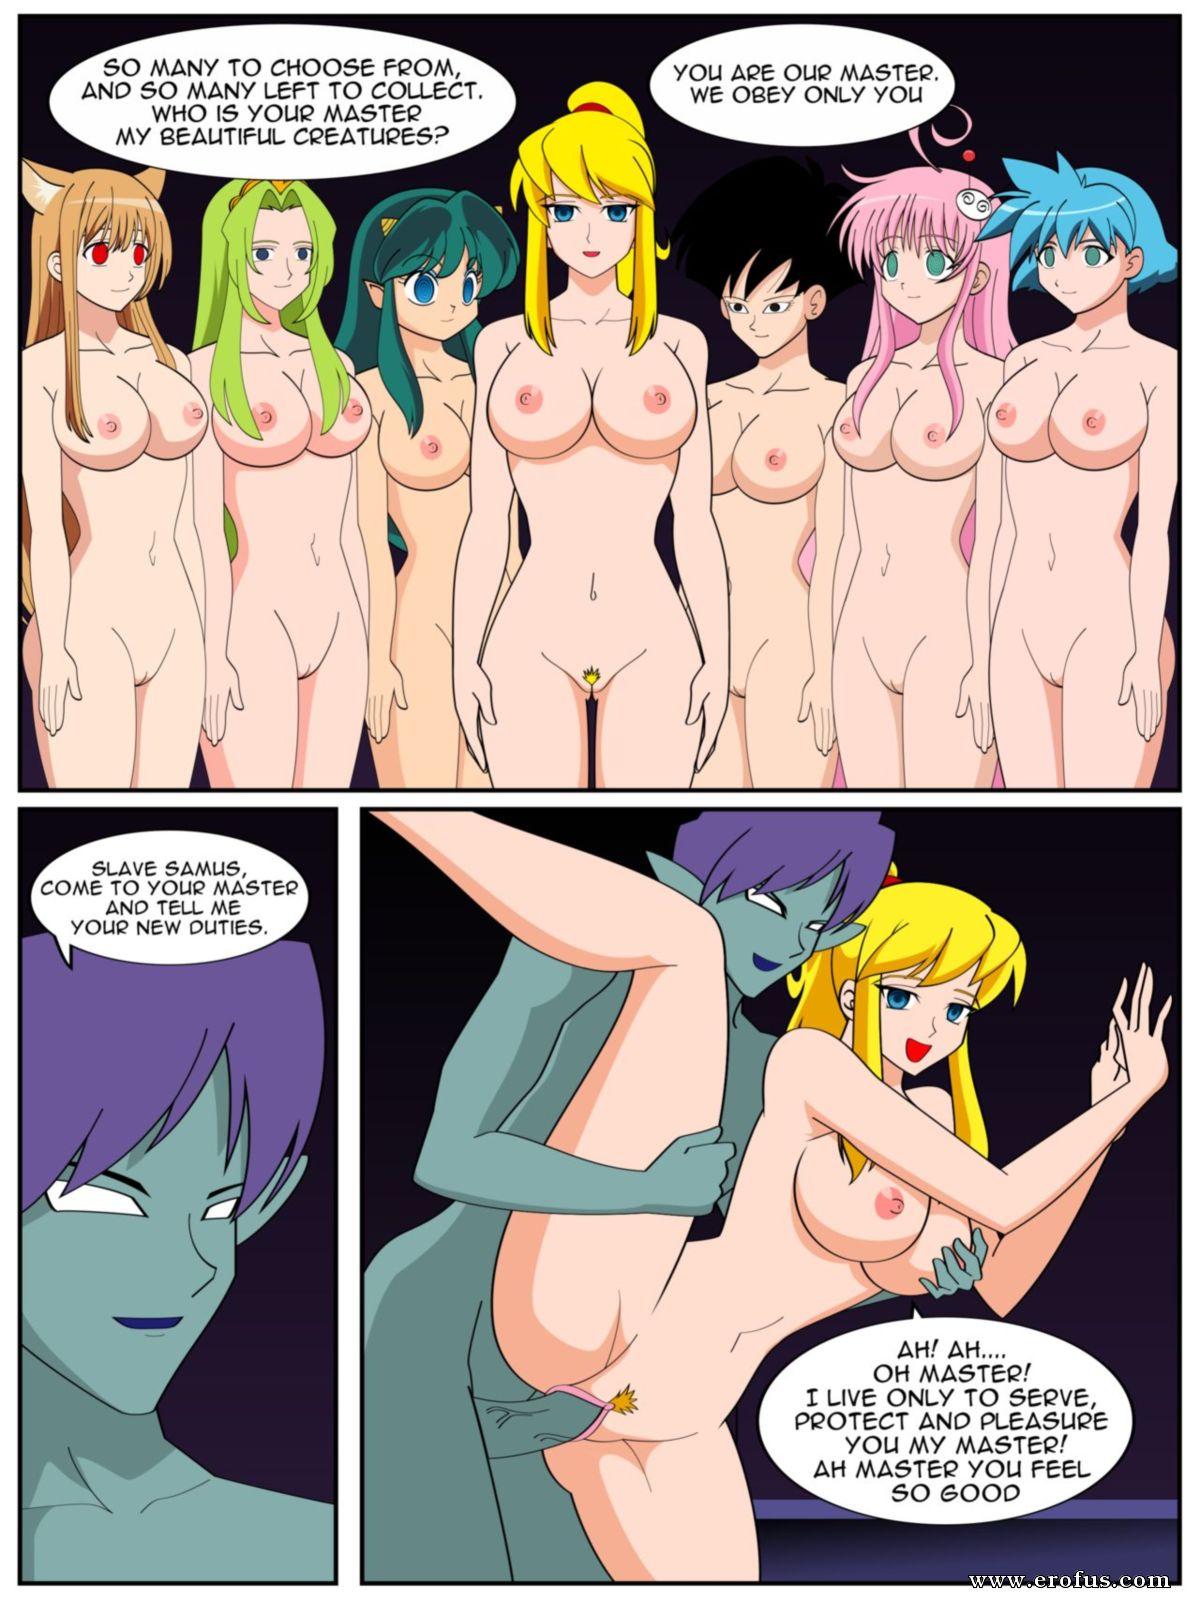 Samus aran porn comic